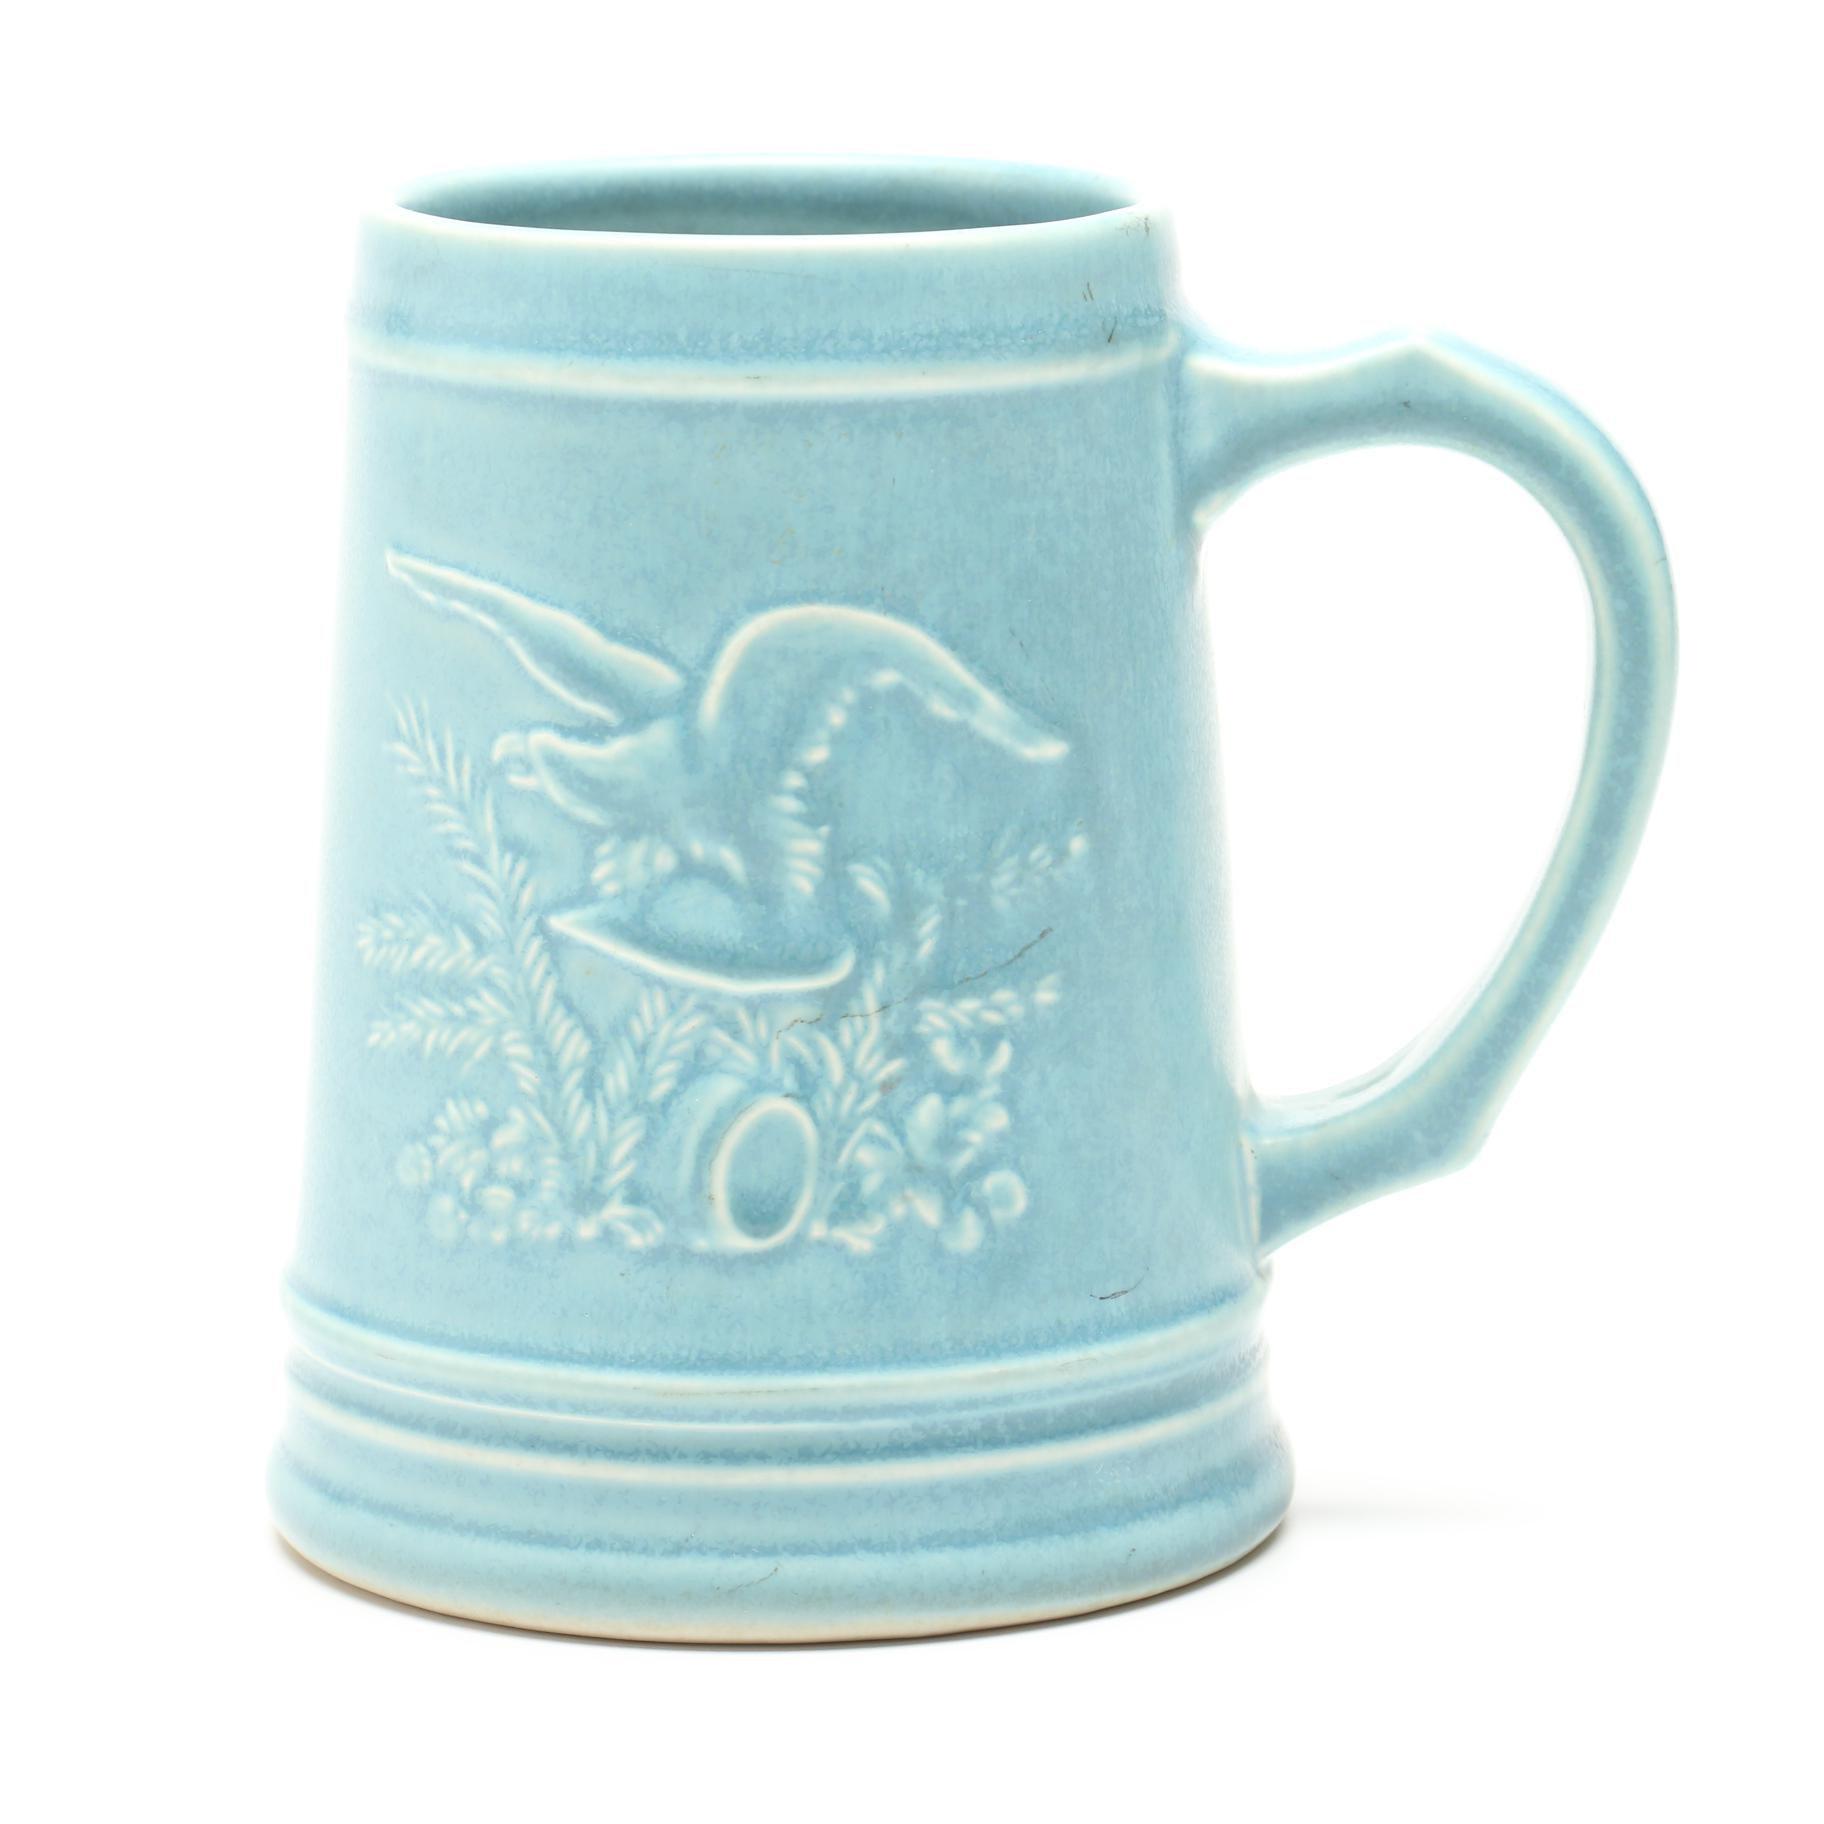 1965 Rookwood Pottery Mug